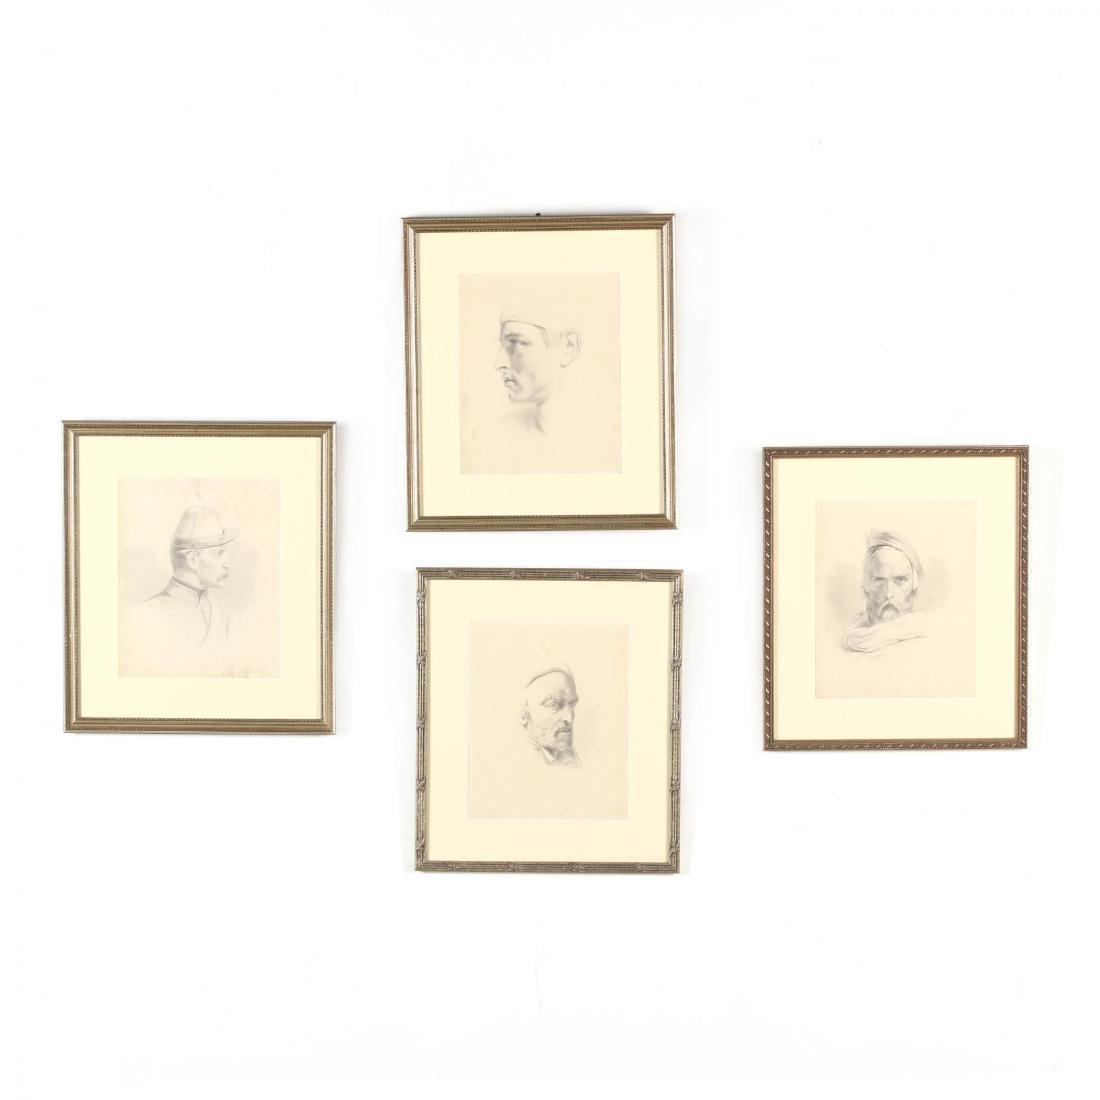 Peter Calvi, Jr. (NY, 1860-1926), Four Character